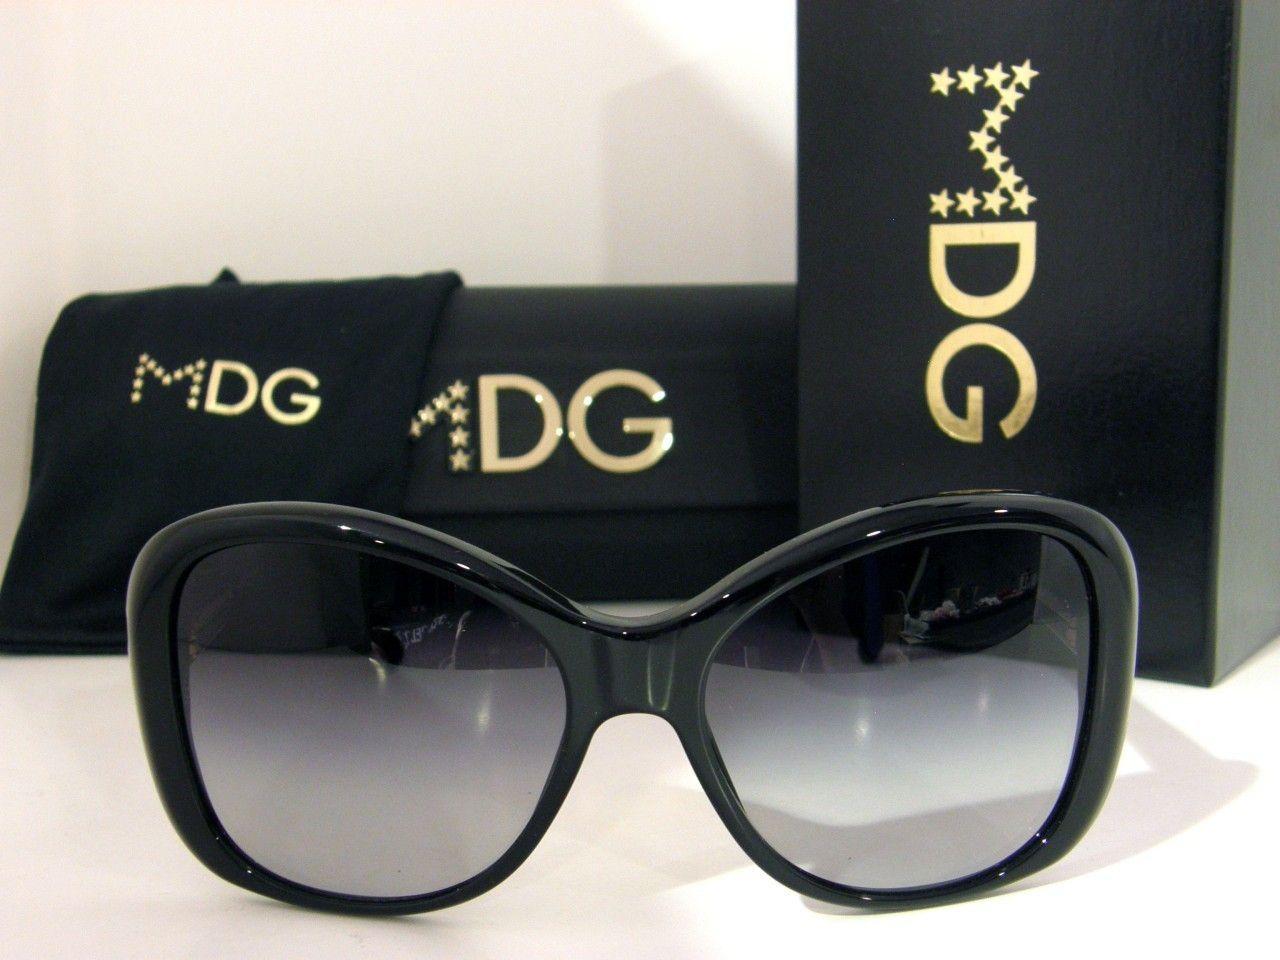 97021be7c82 Dolce and Gabbana Sunglasses (Madonna edition)